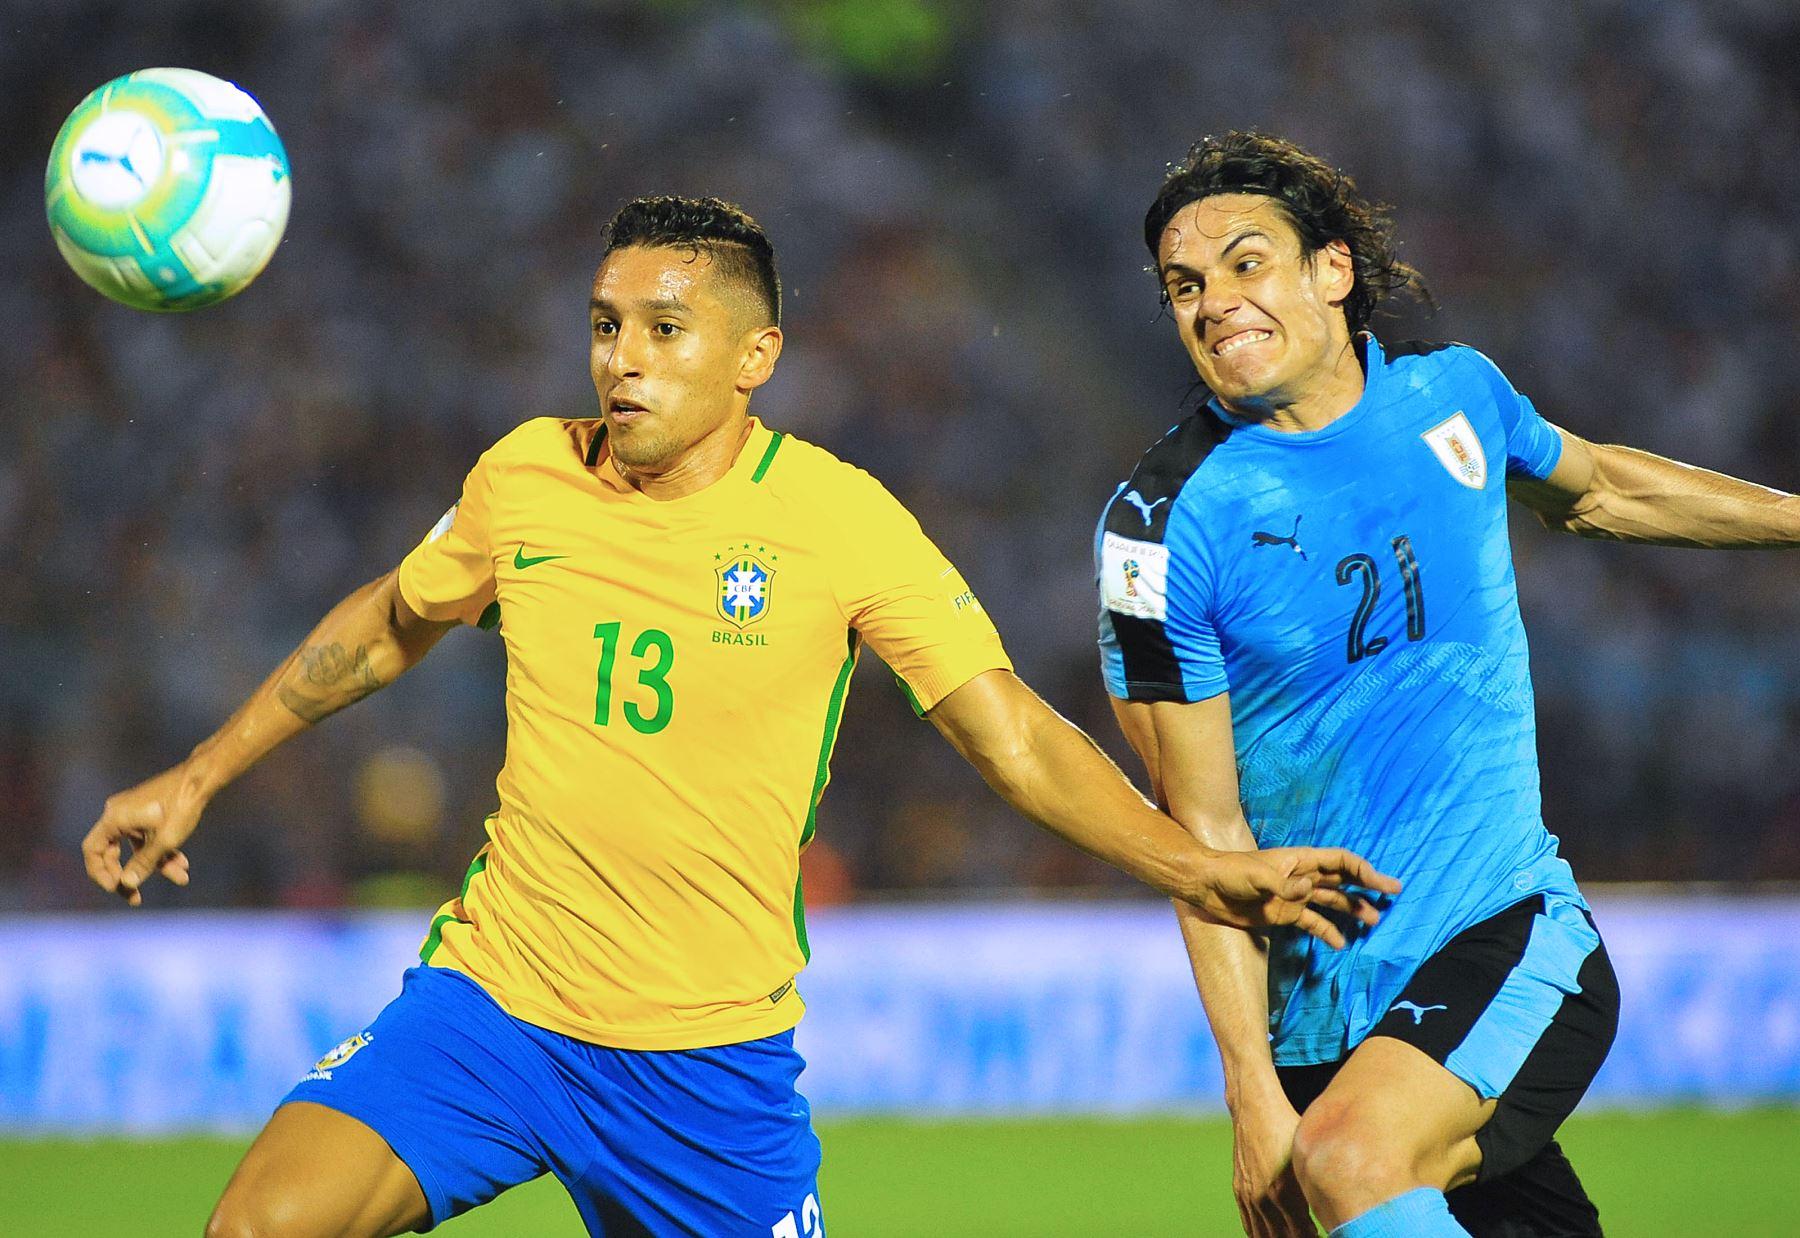 primera-etapa-uruguay-y-brasil-empatan-0-a-0